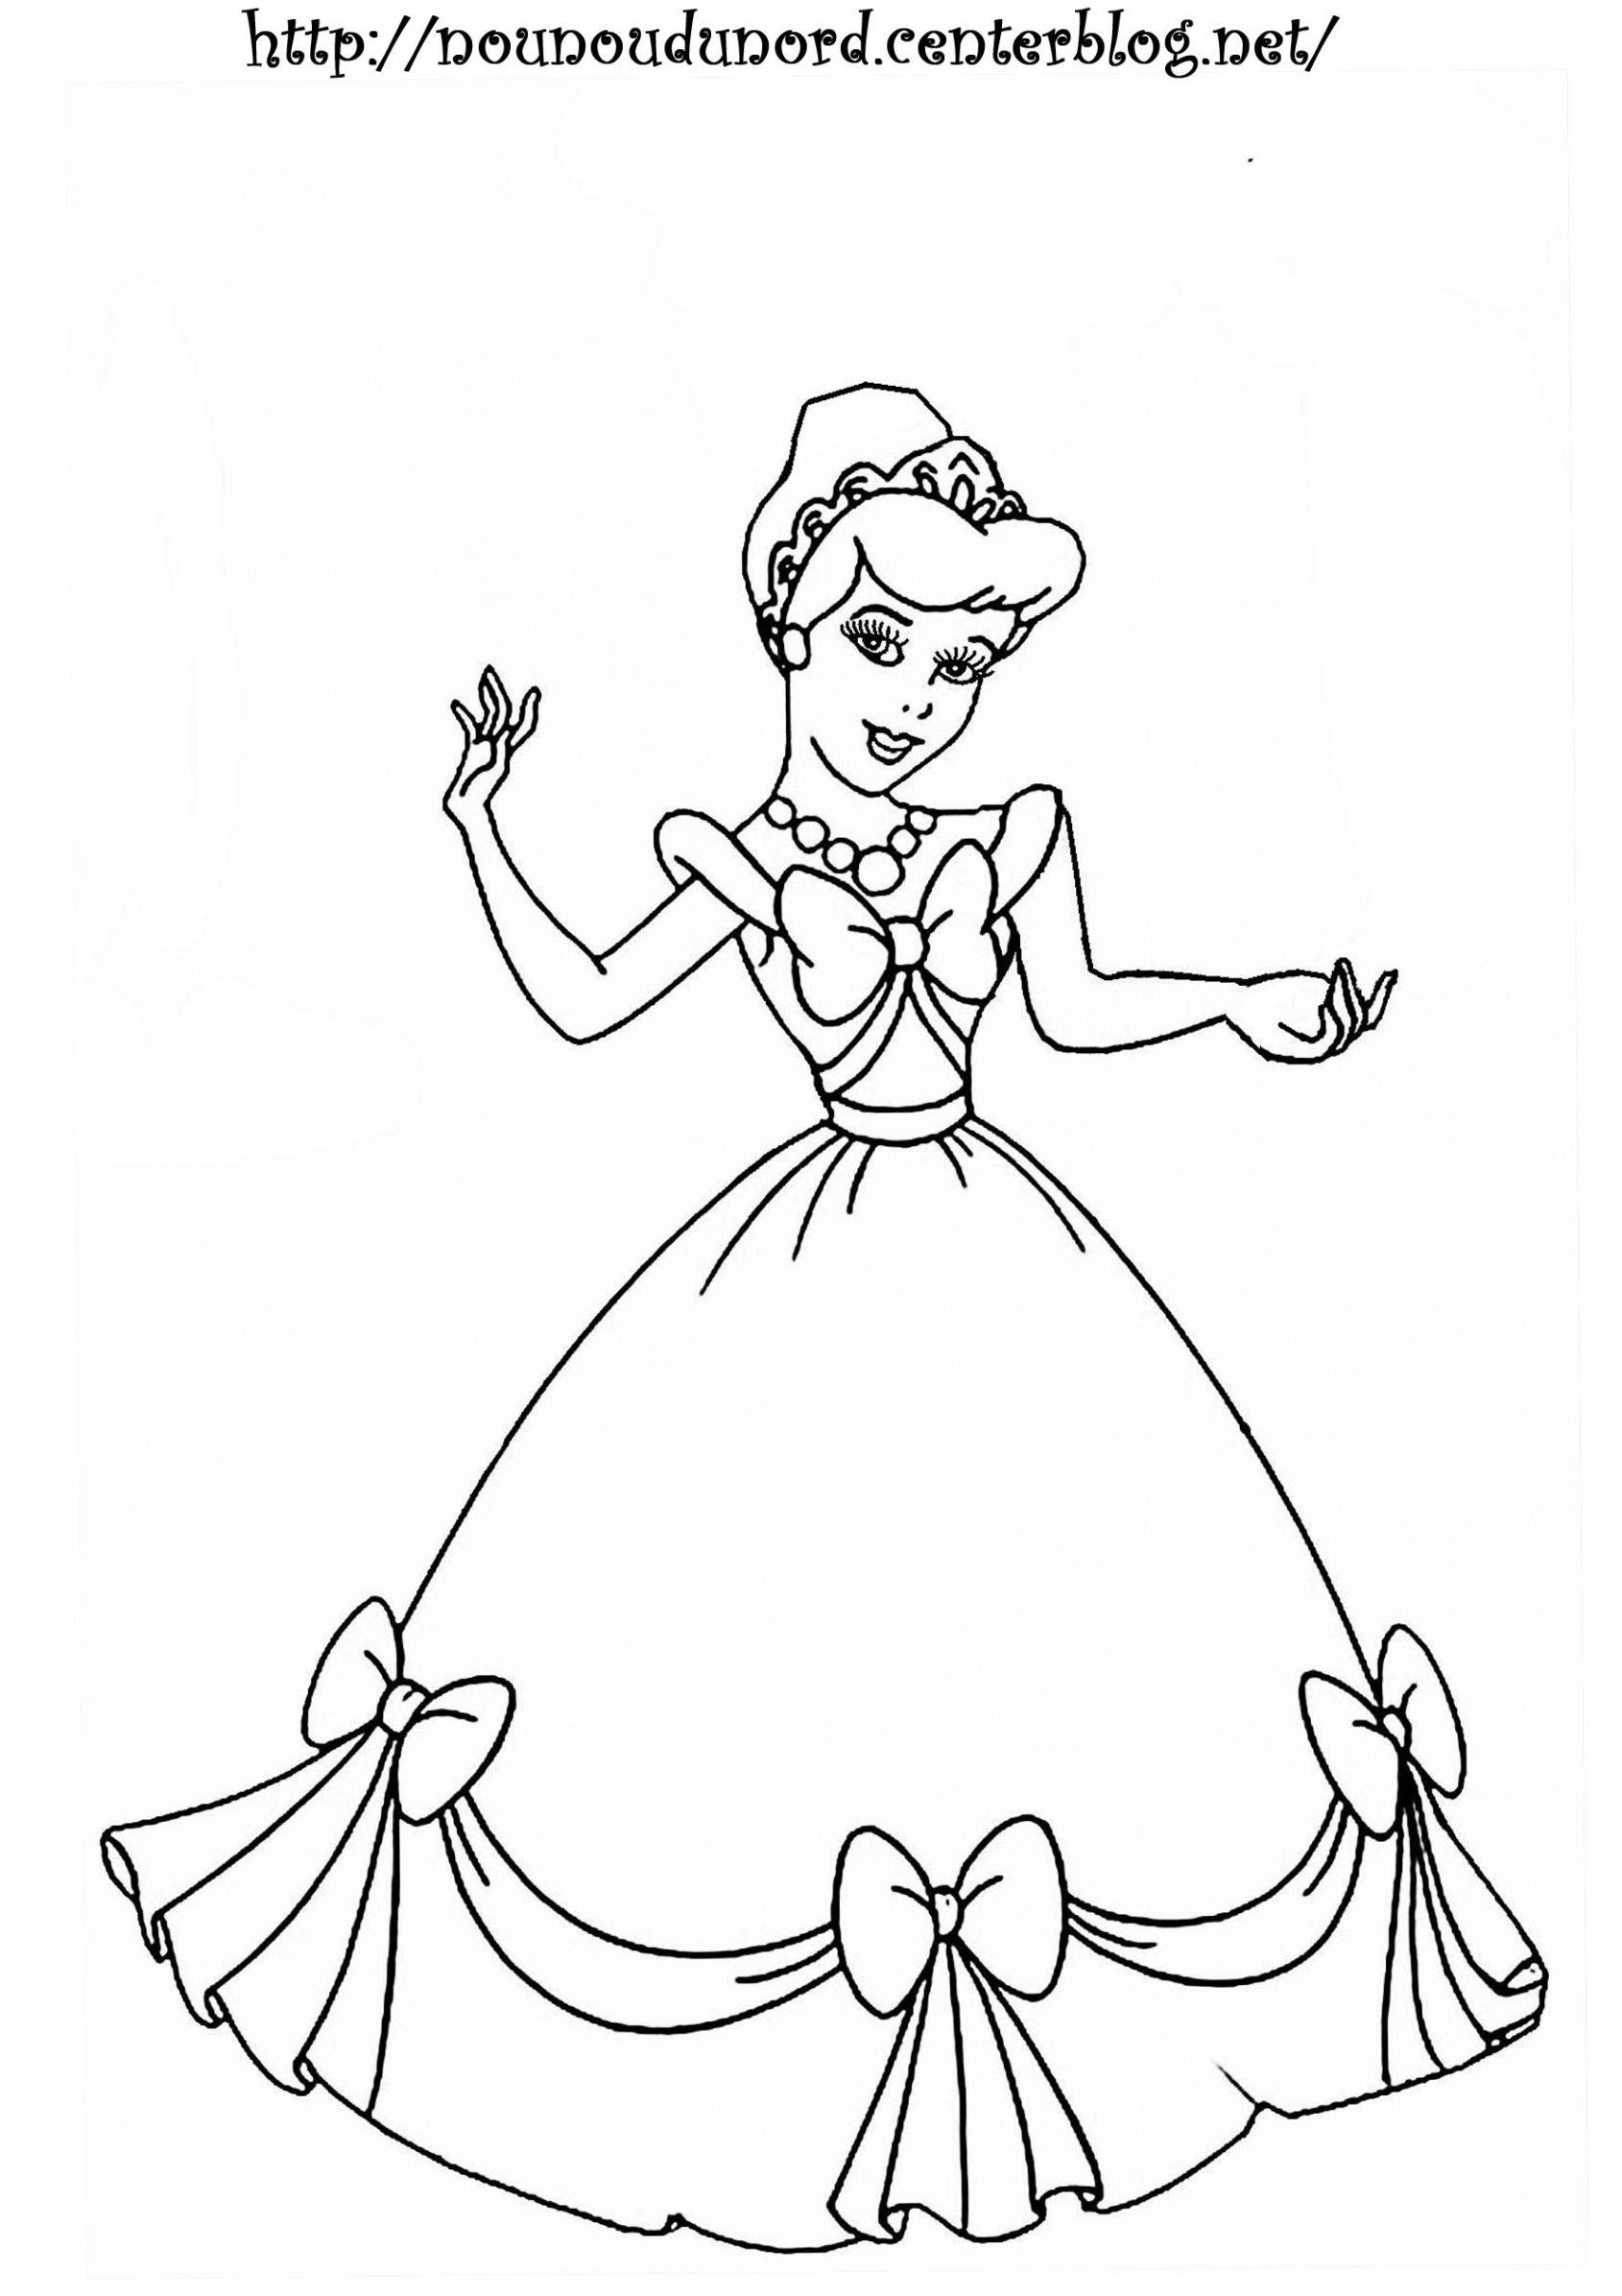 22 Dessins De Coloriage Princesse À Imprimer regarding Image